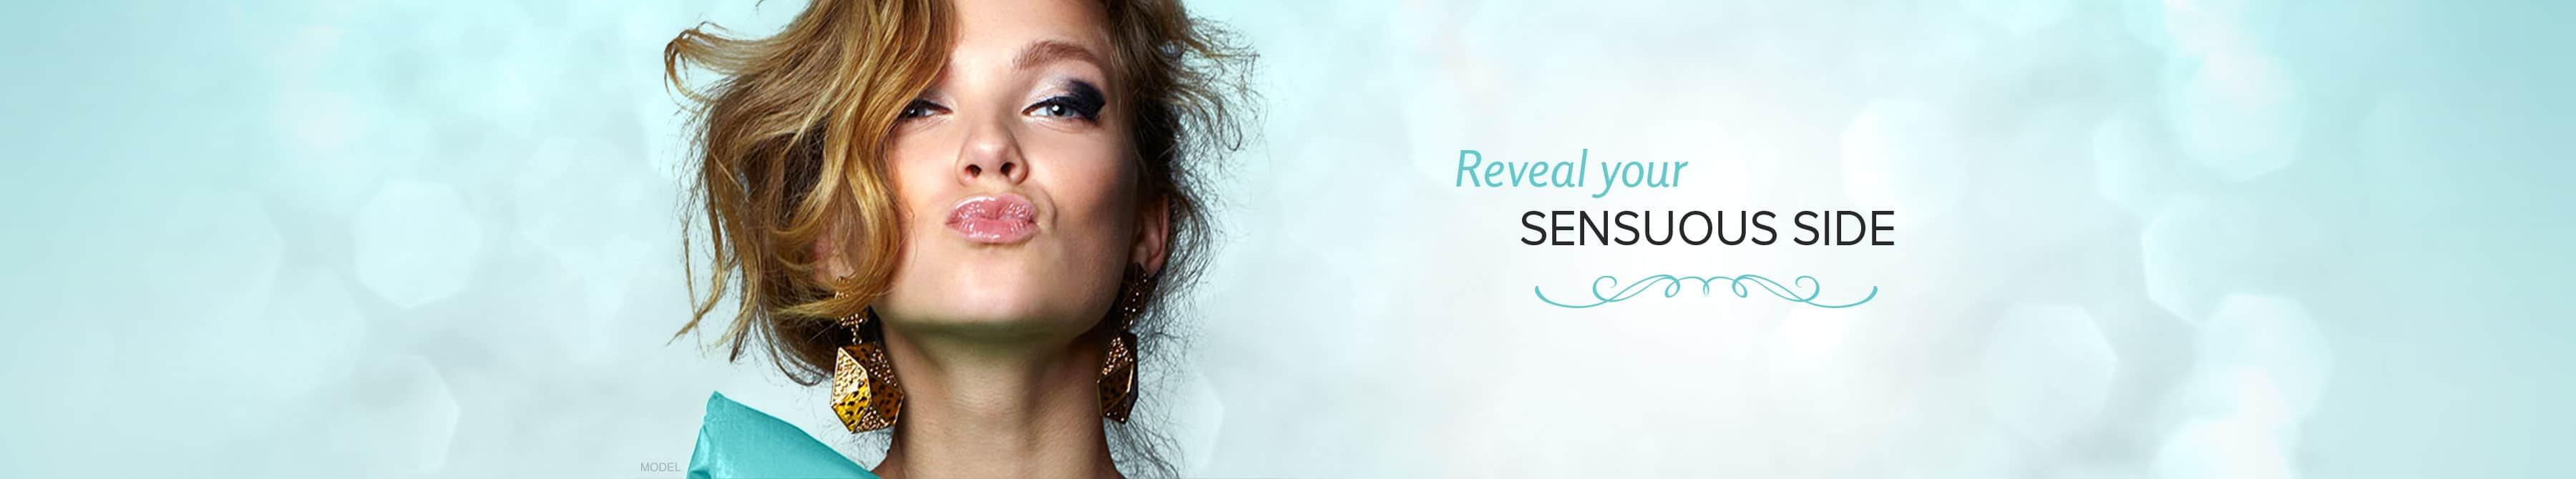 Lip Enhancement With Injections in Atlanta   Buckhead Plastic Surgery